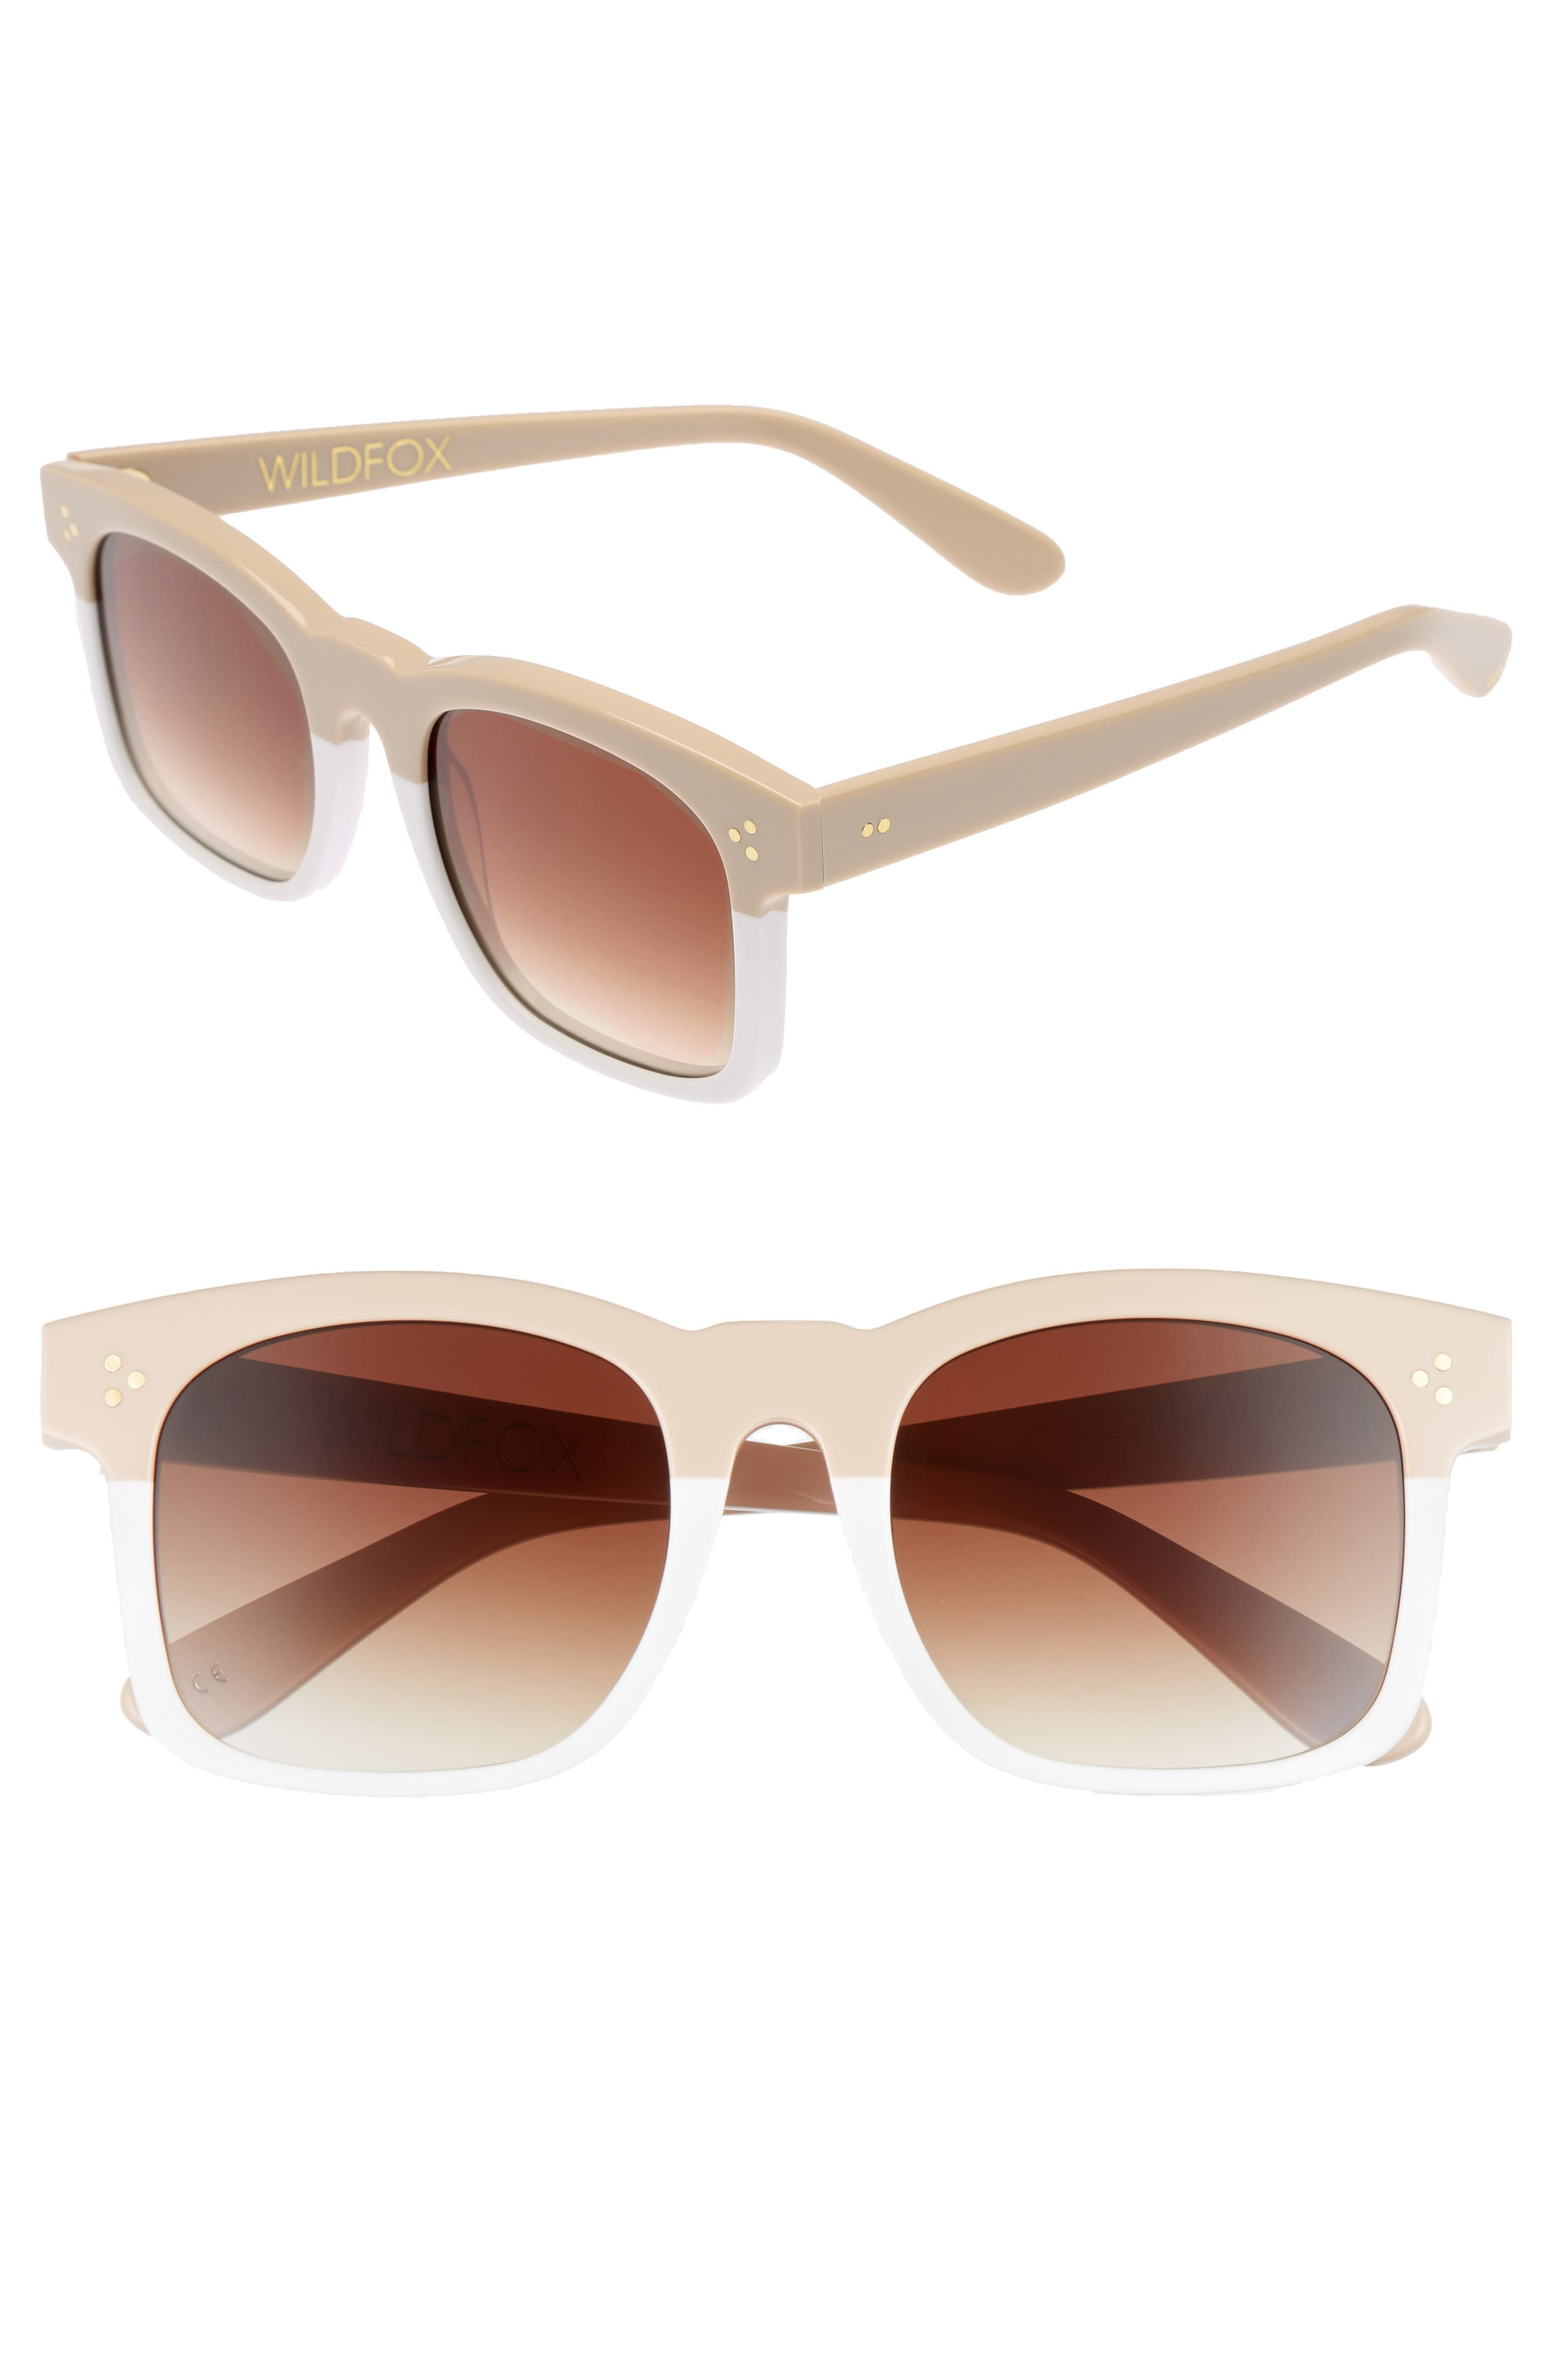 Wildfox Gaudy Zero 51mm Flat Square Sunglasses